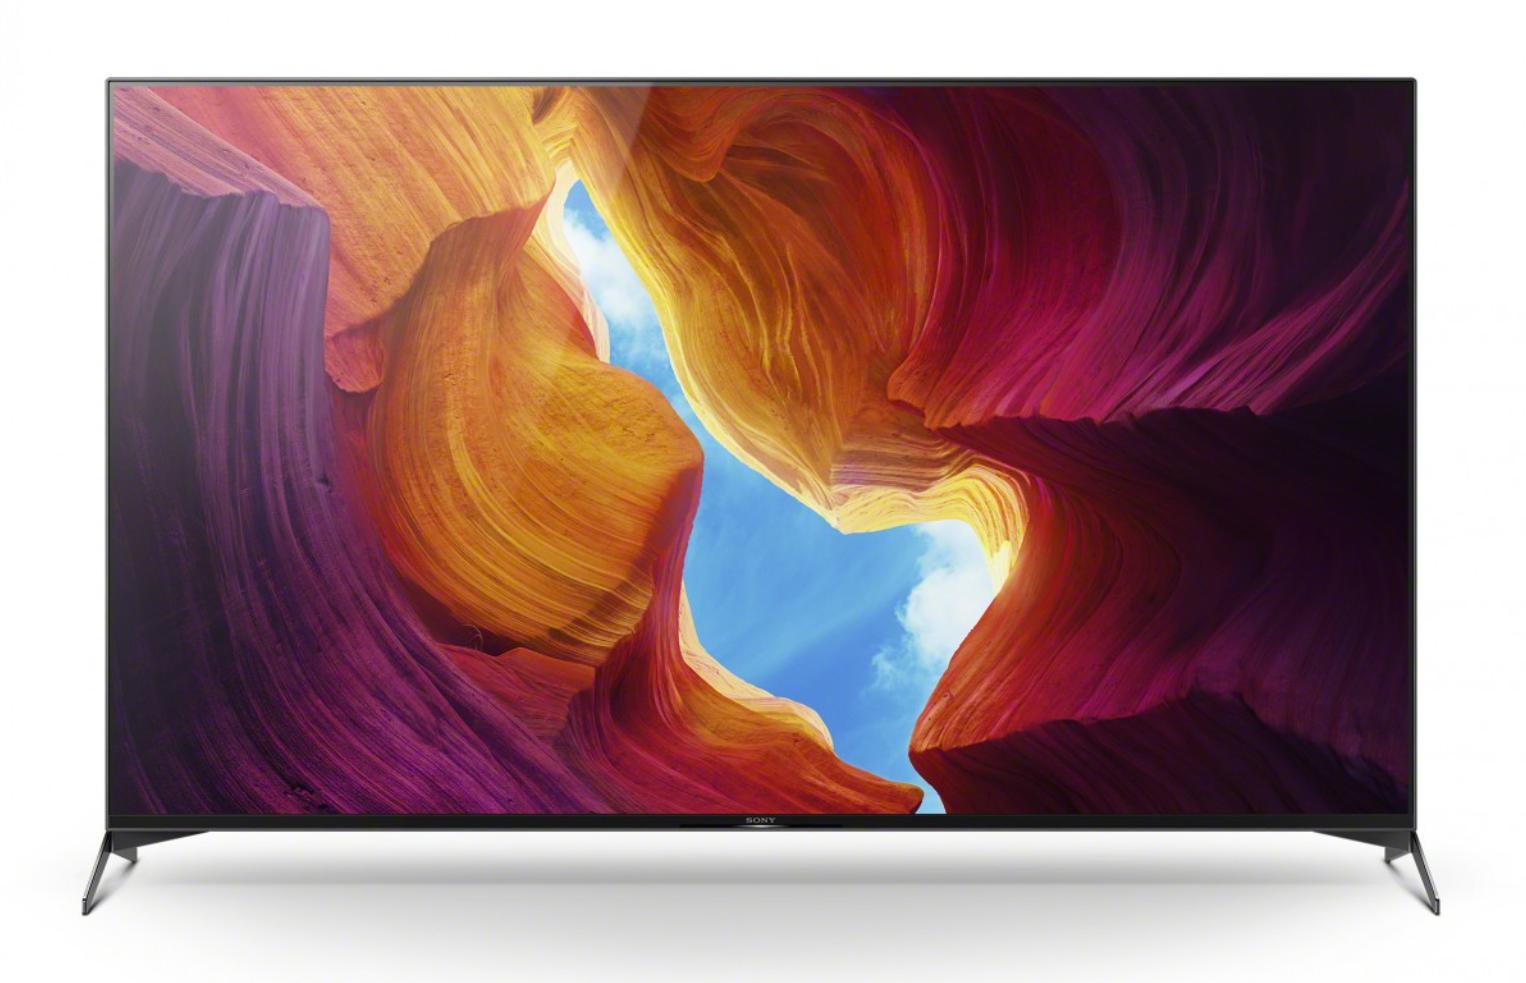 "TV 55"" Sony KD-55XH9505 BAEP - 4K UHD, Full LED, 100 Hz, Android TV"